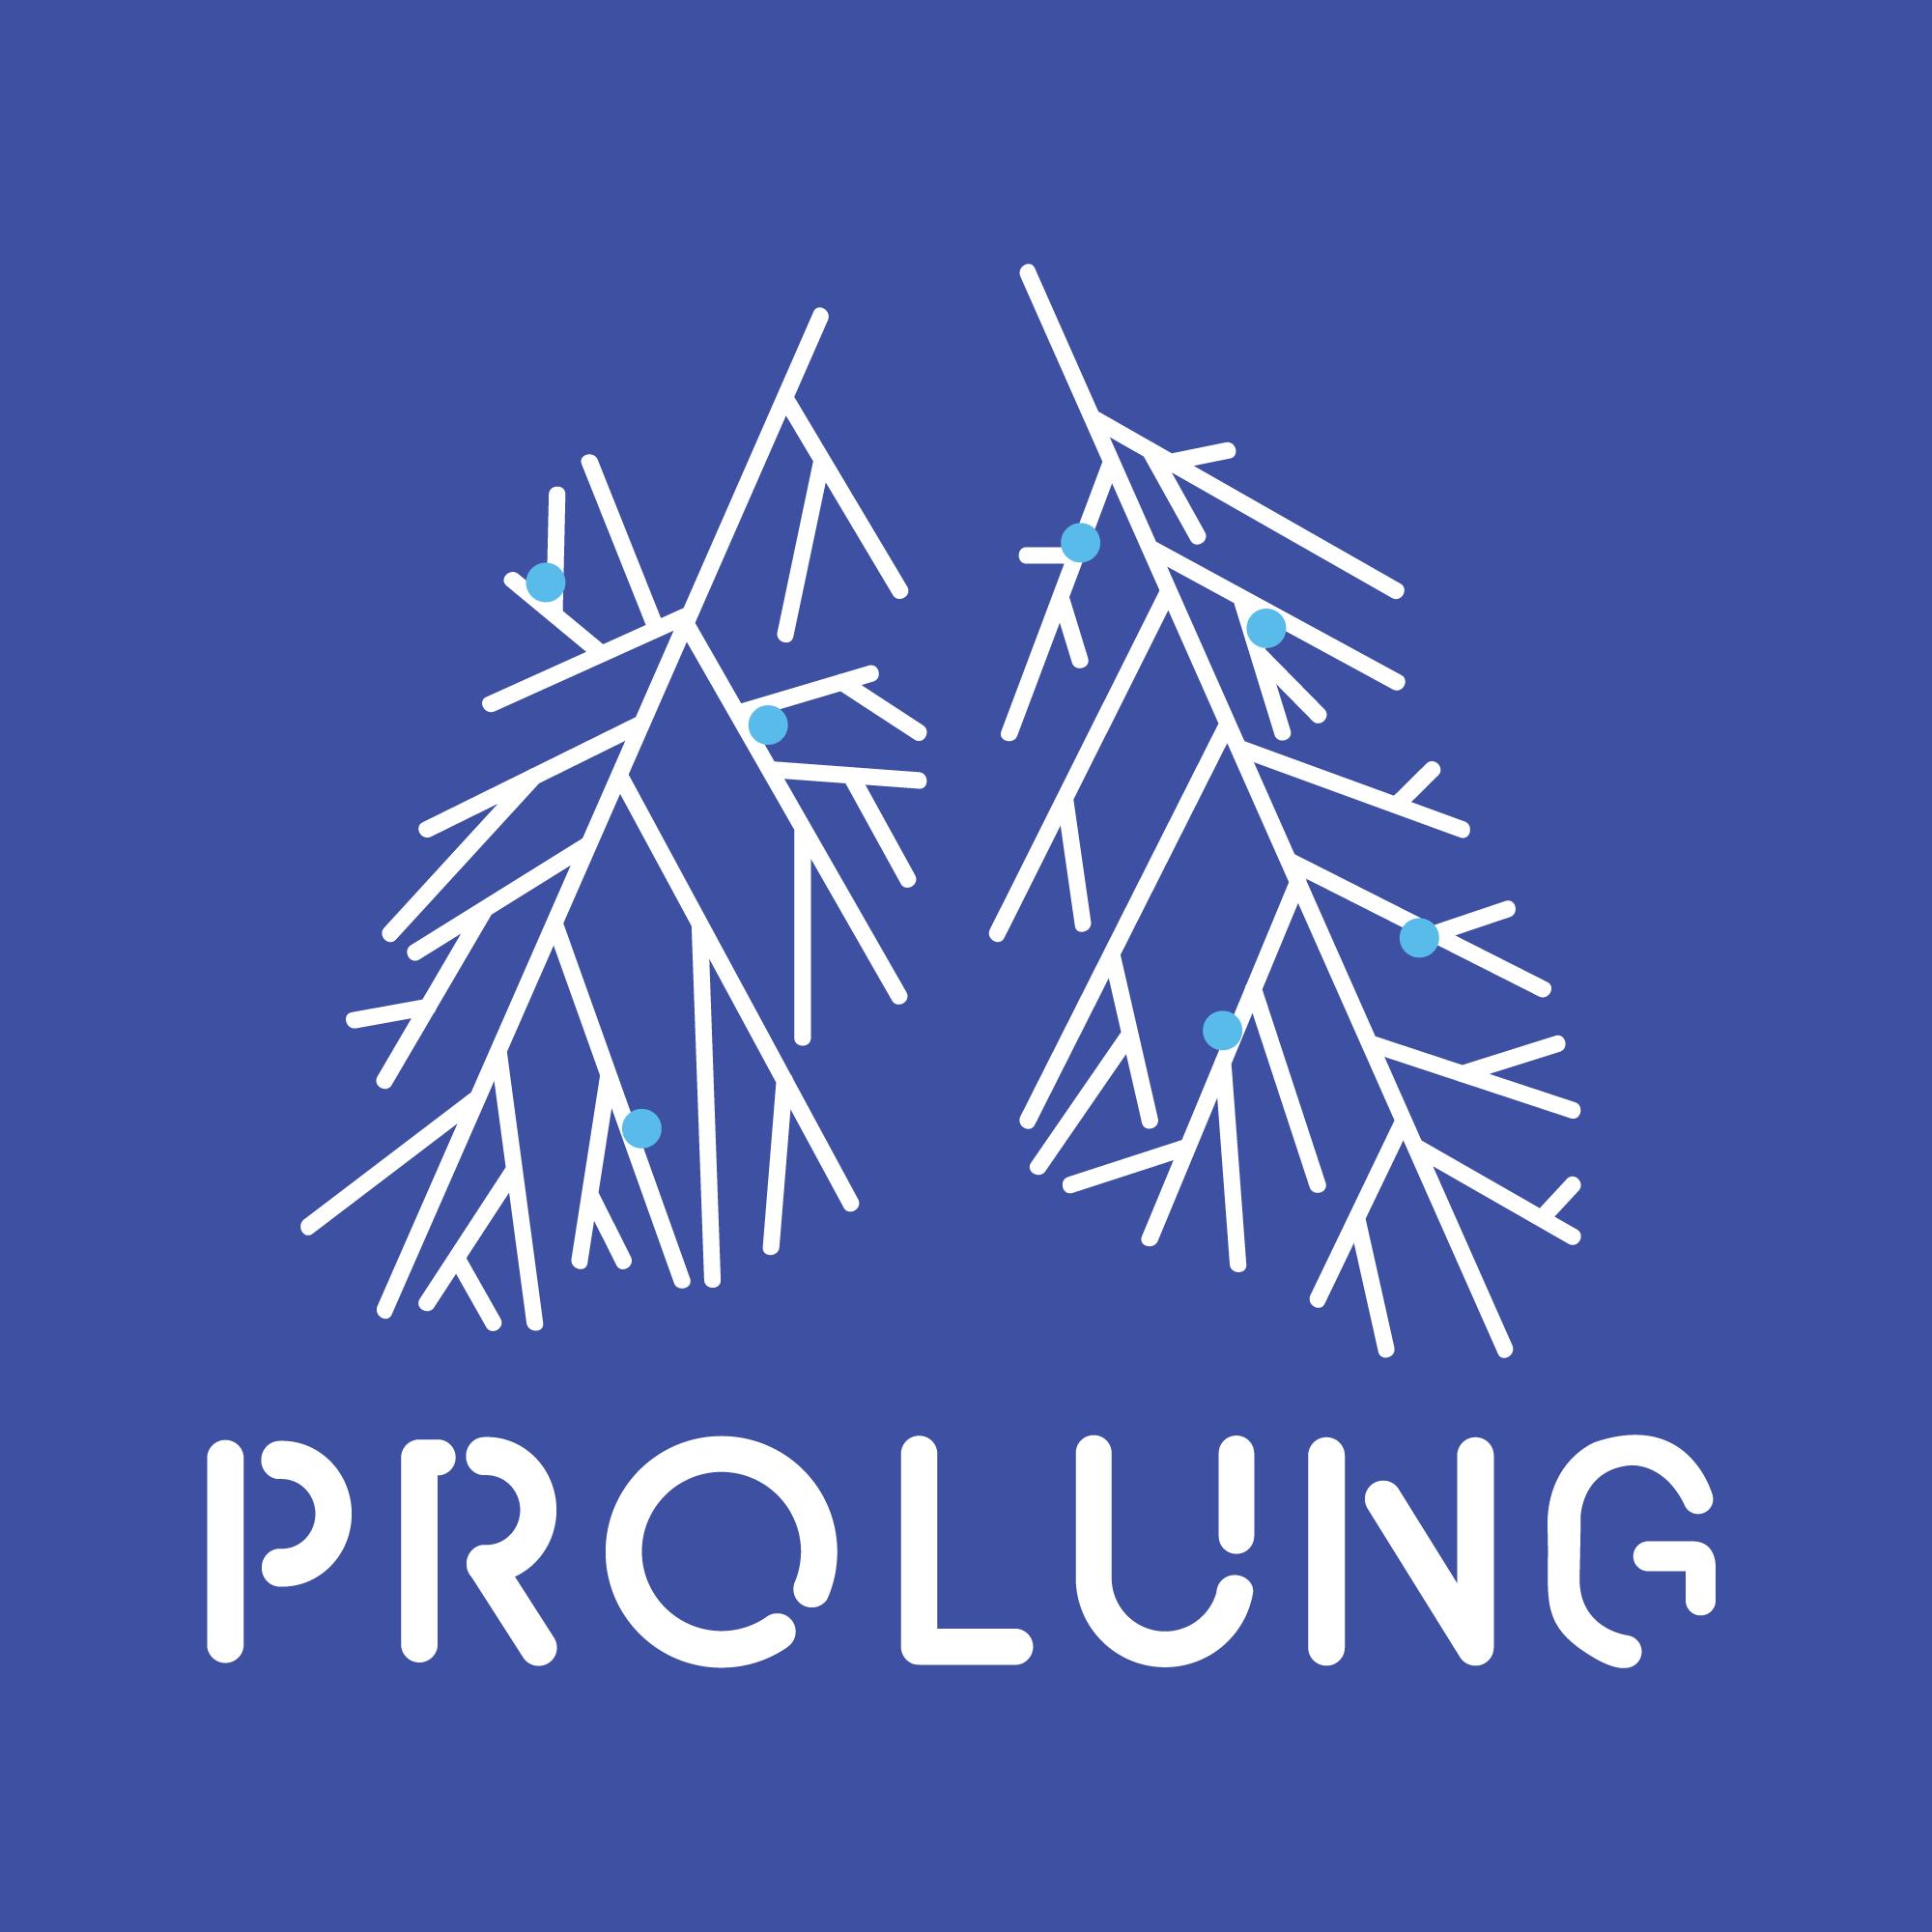 prolung-blue